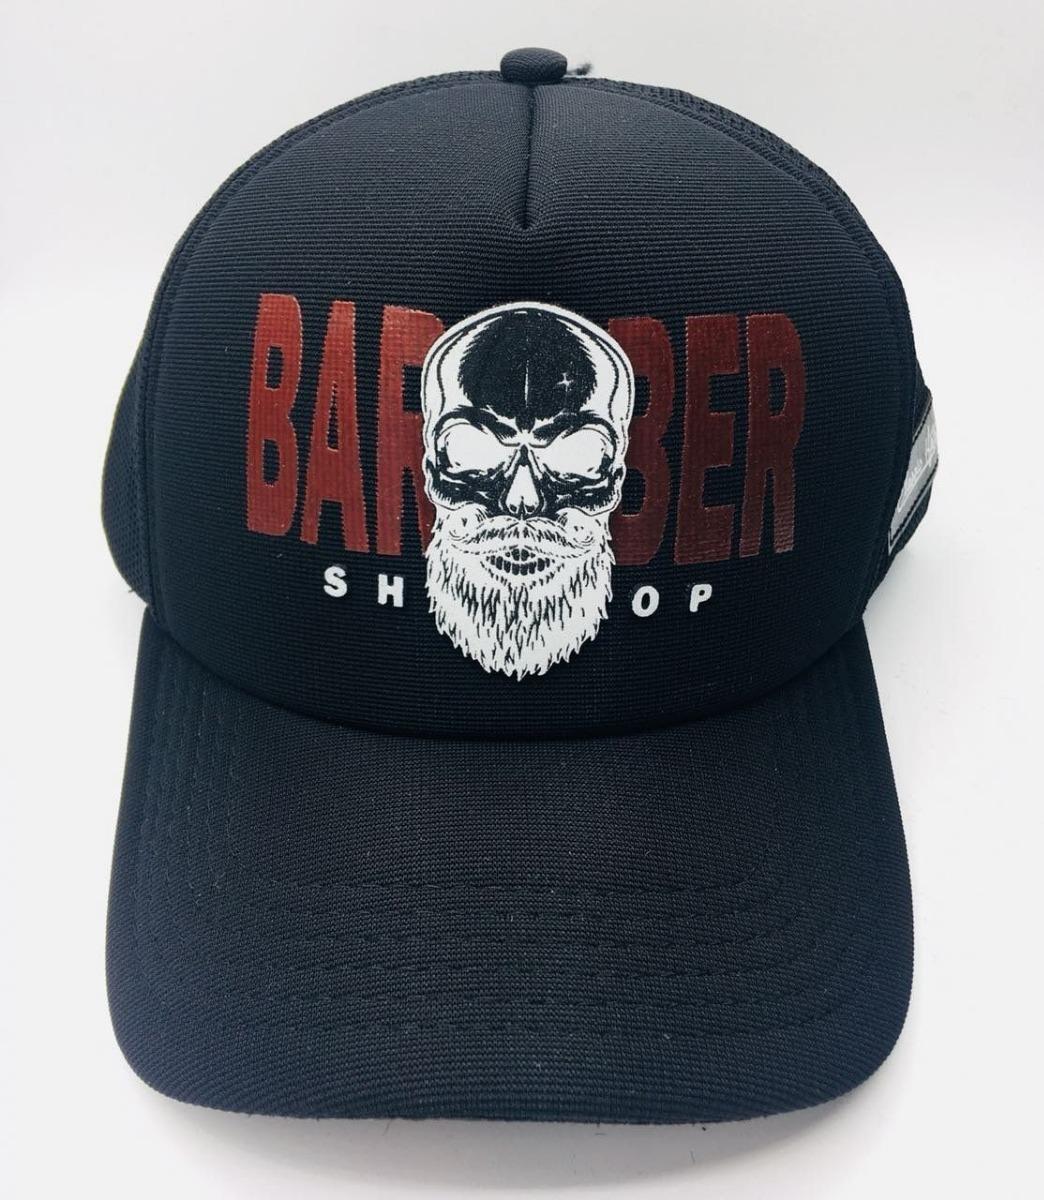 b101b16de973f Kit com bonés barber shop barbeiro trucker tela barbearia em mercado livre  jpg 1044x1200 Bones barber